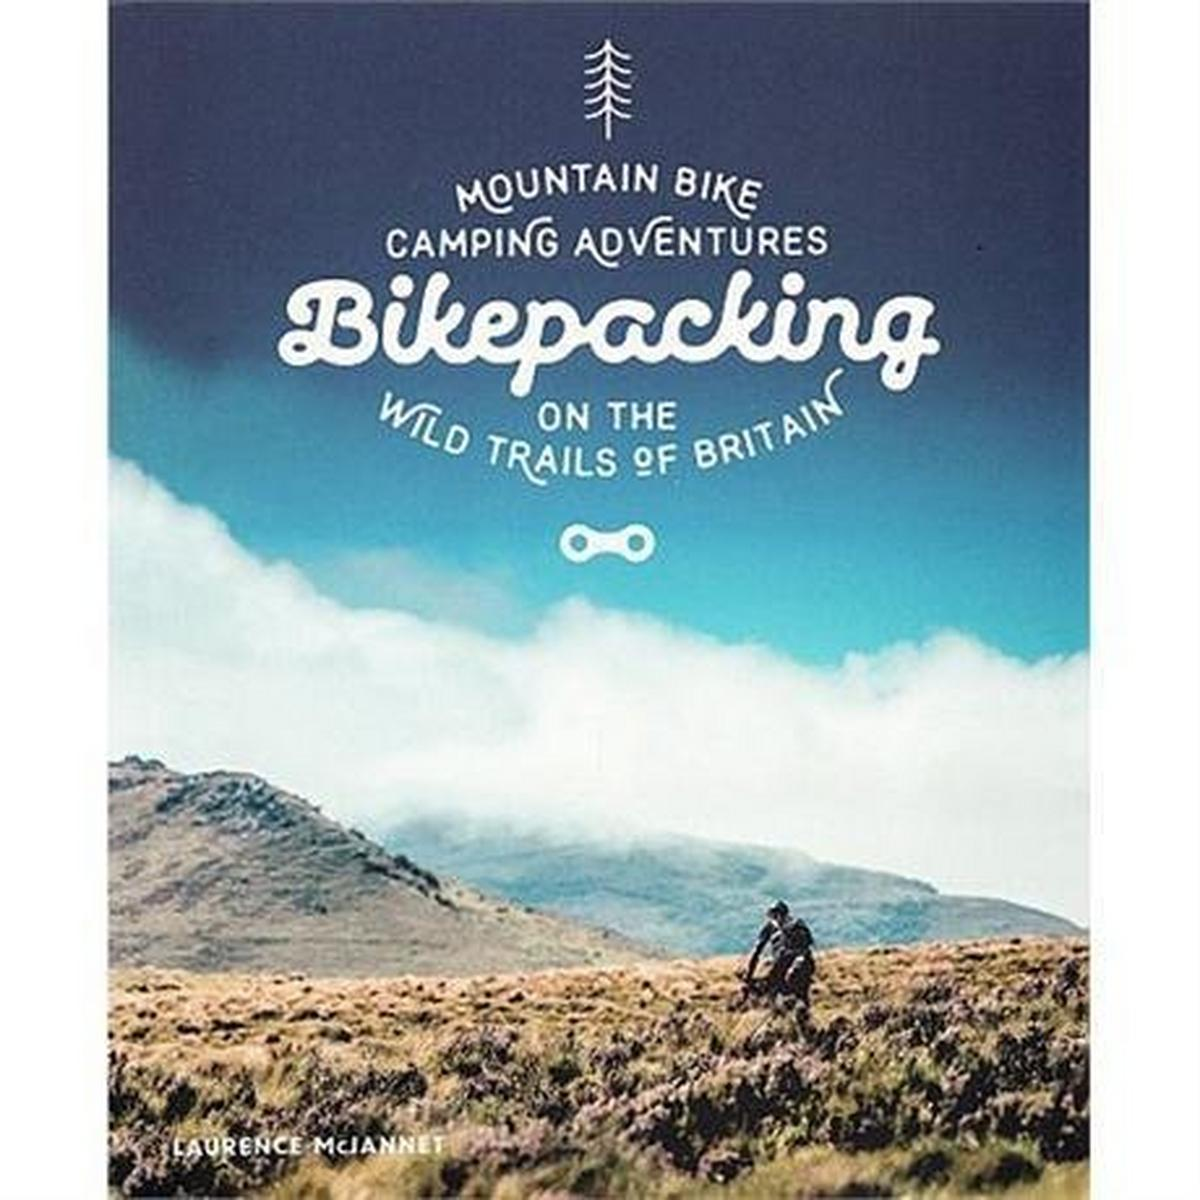 Miscellaneous Book: Bikepacking: Mountain Bike Camping Adventures